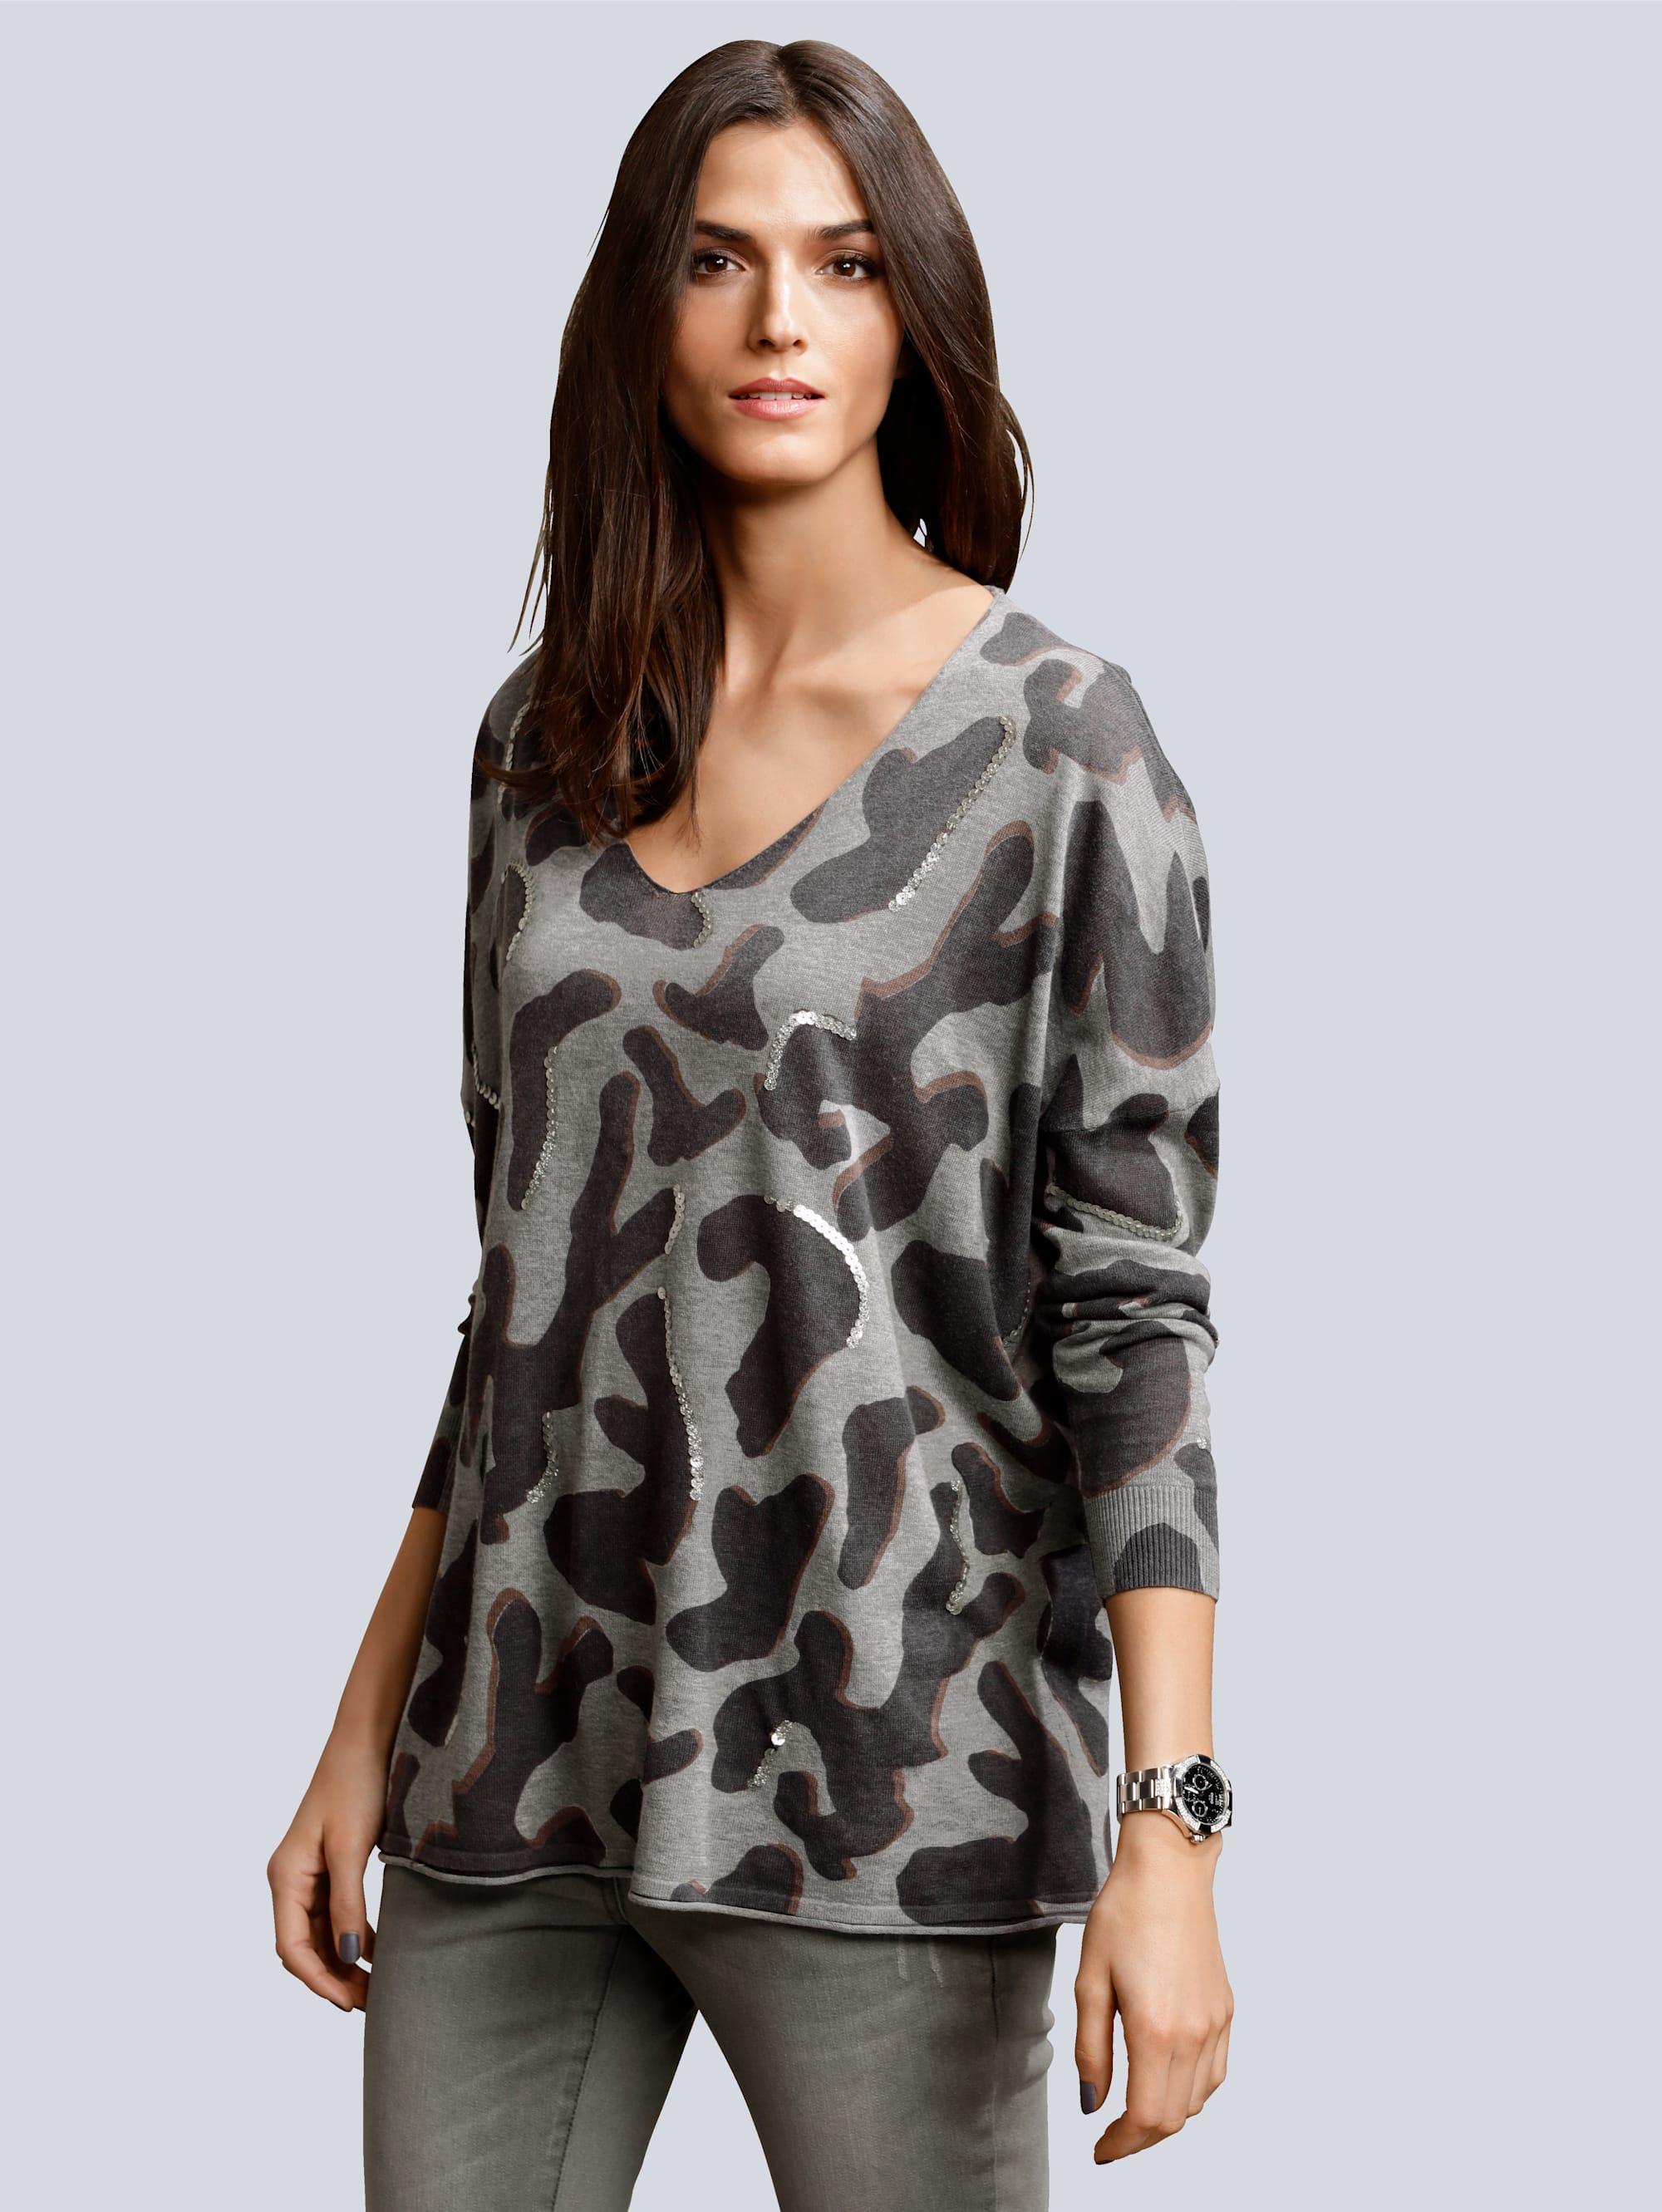 Alba Moda Pullover in trendiger Oversizedform K7Uyz toff8